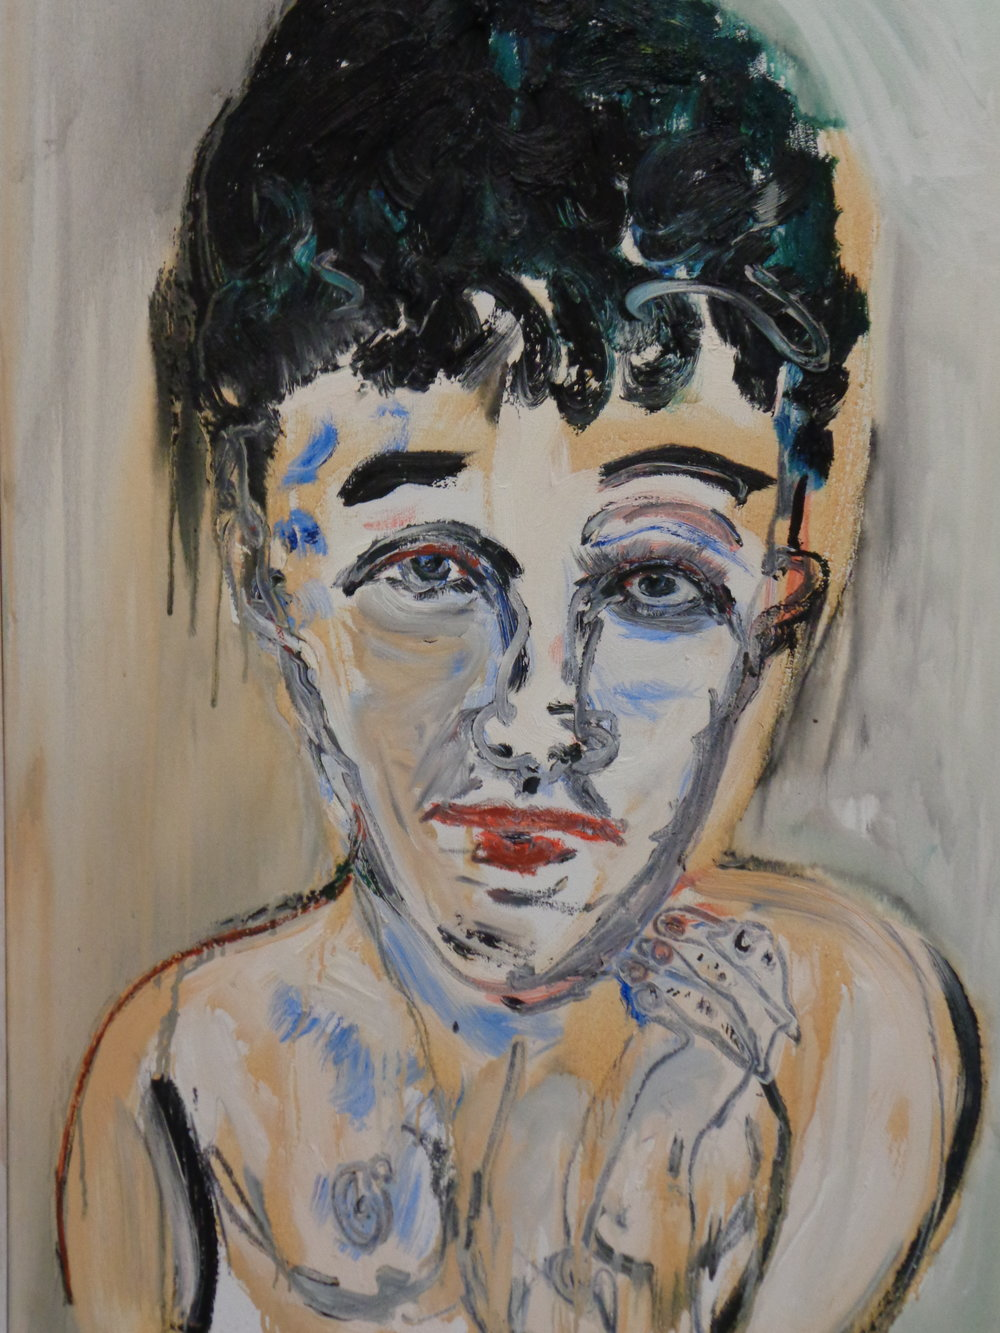 Siobhan Gazing - oil on canvas 2016